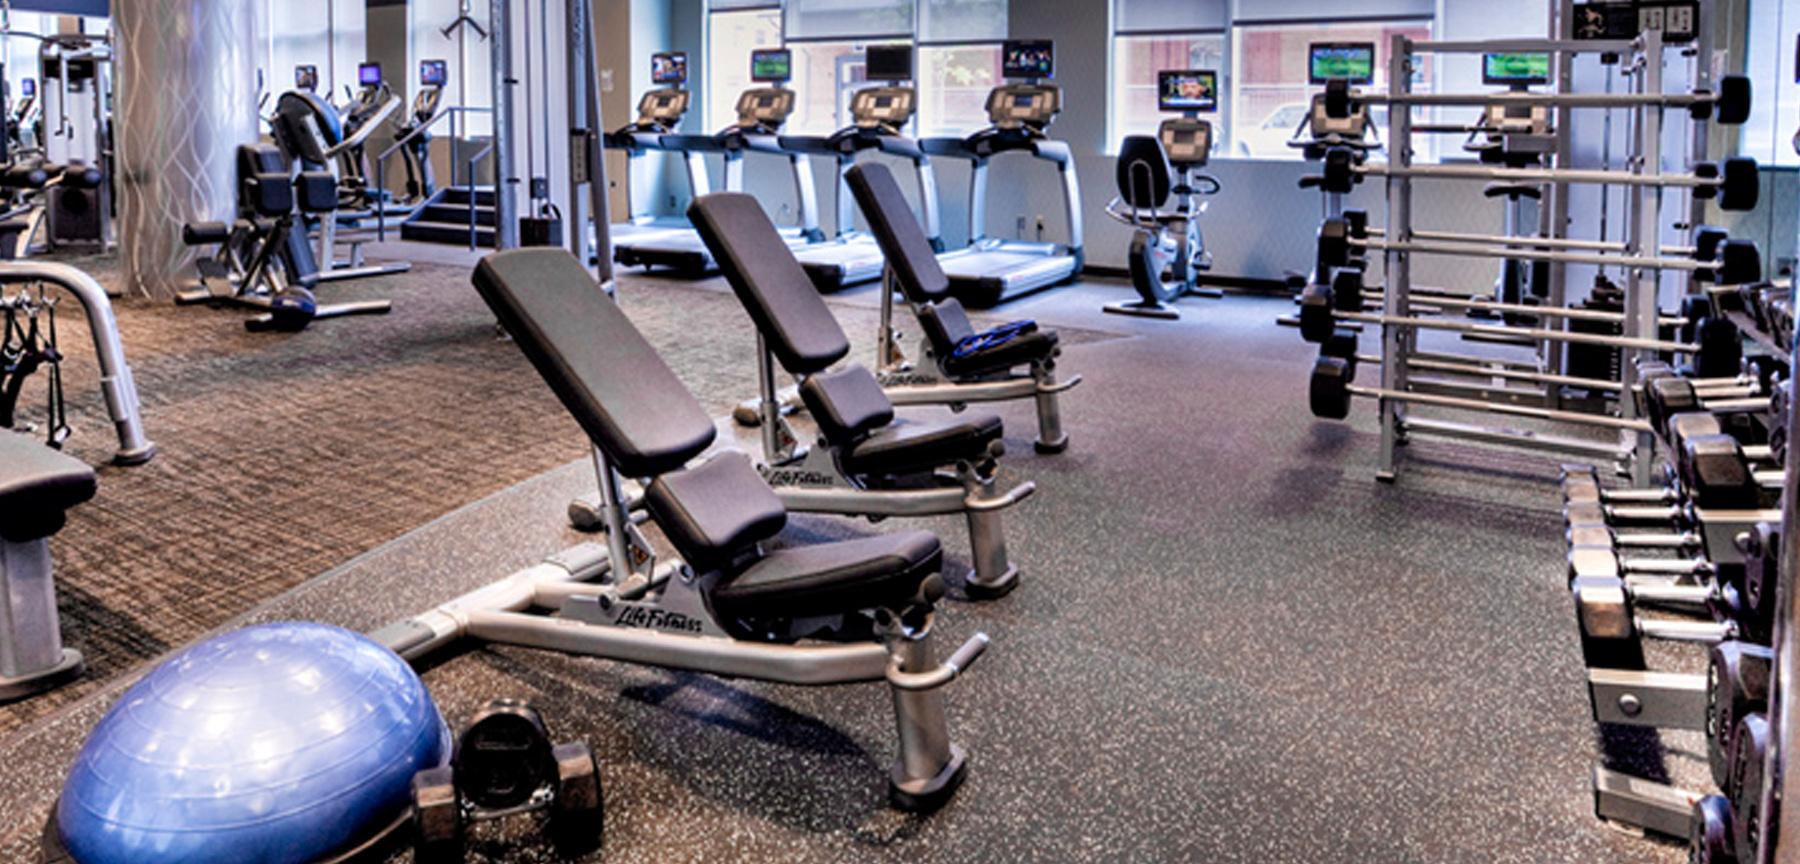 1401 Wynkoop Fitness Center fitness room